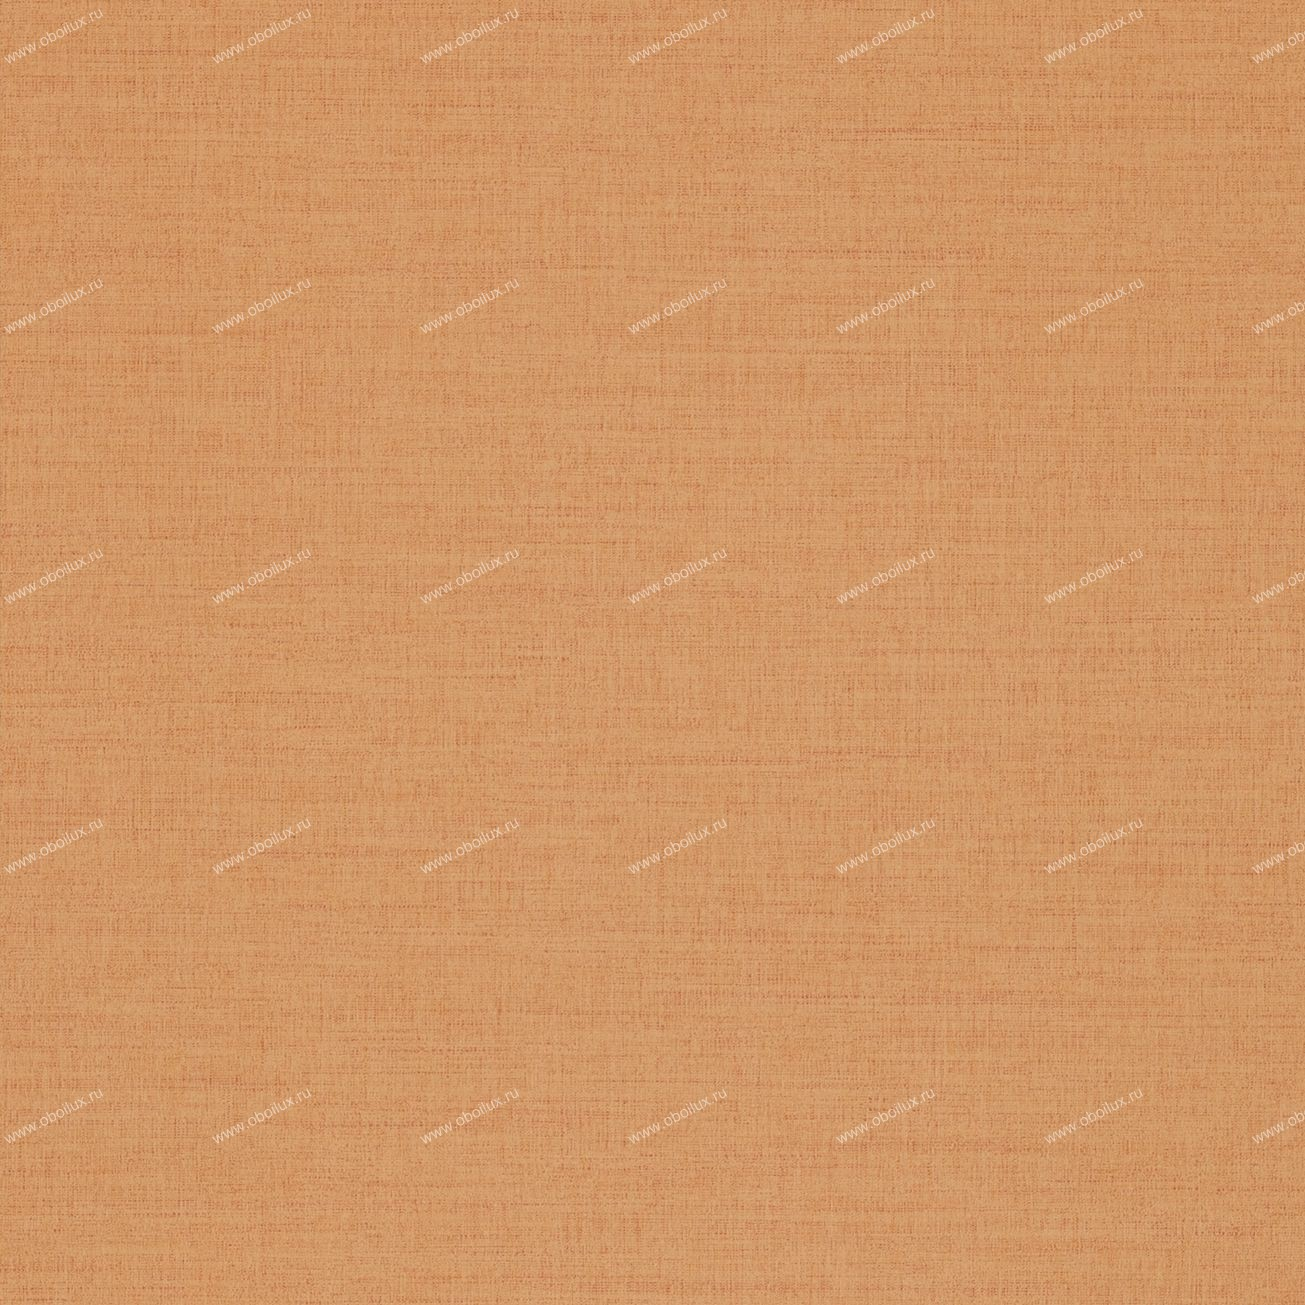 Английские обои Sanderson,  коллекция Colour for Living, артикул211684